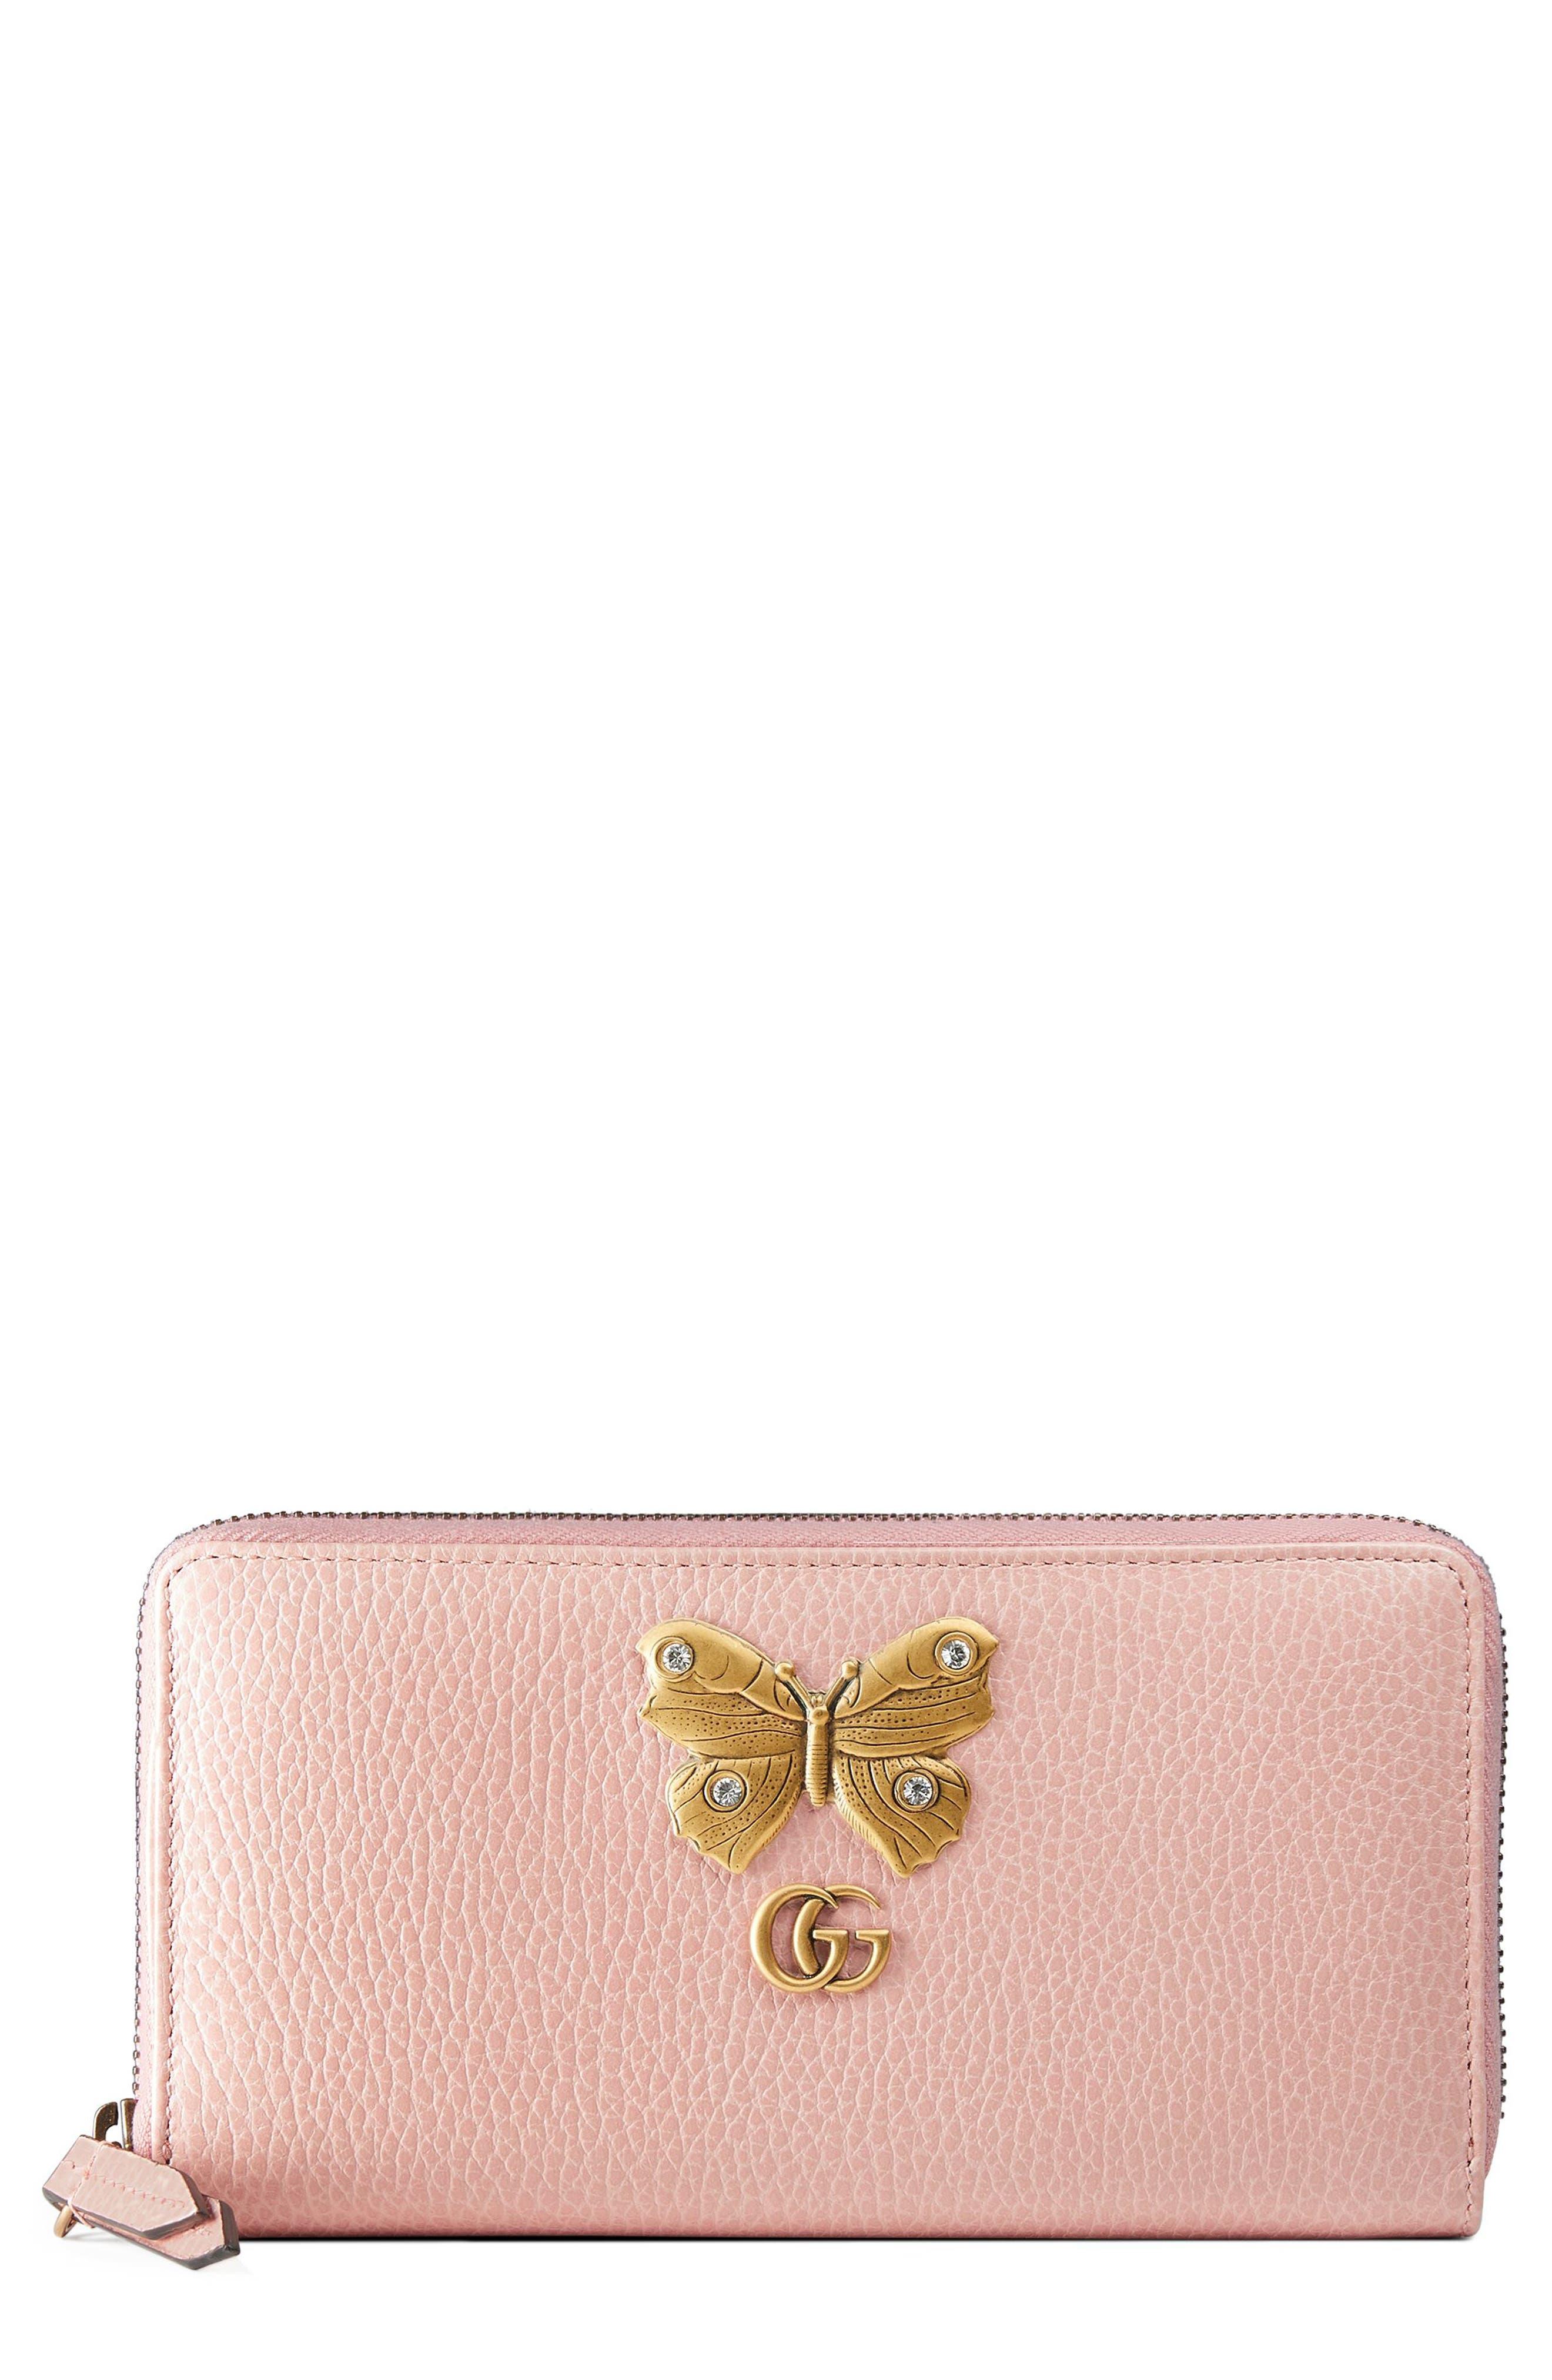 GUCCI, Farfalla Zip Around Leather Wallet, Main thumbnail 1, color, PERFECT PINK/ CRYSTAL